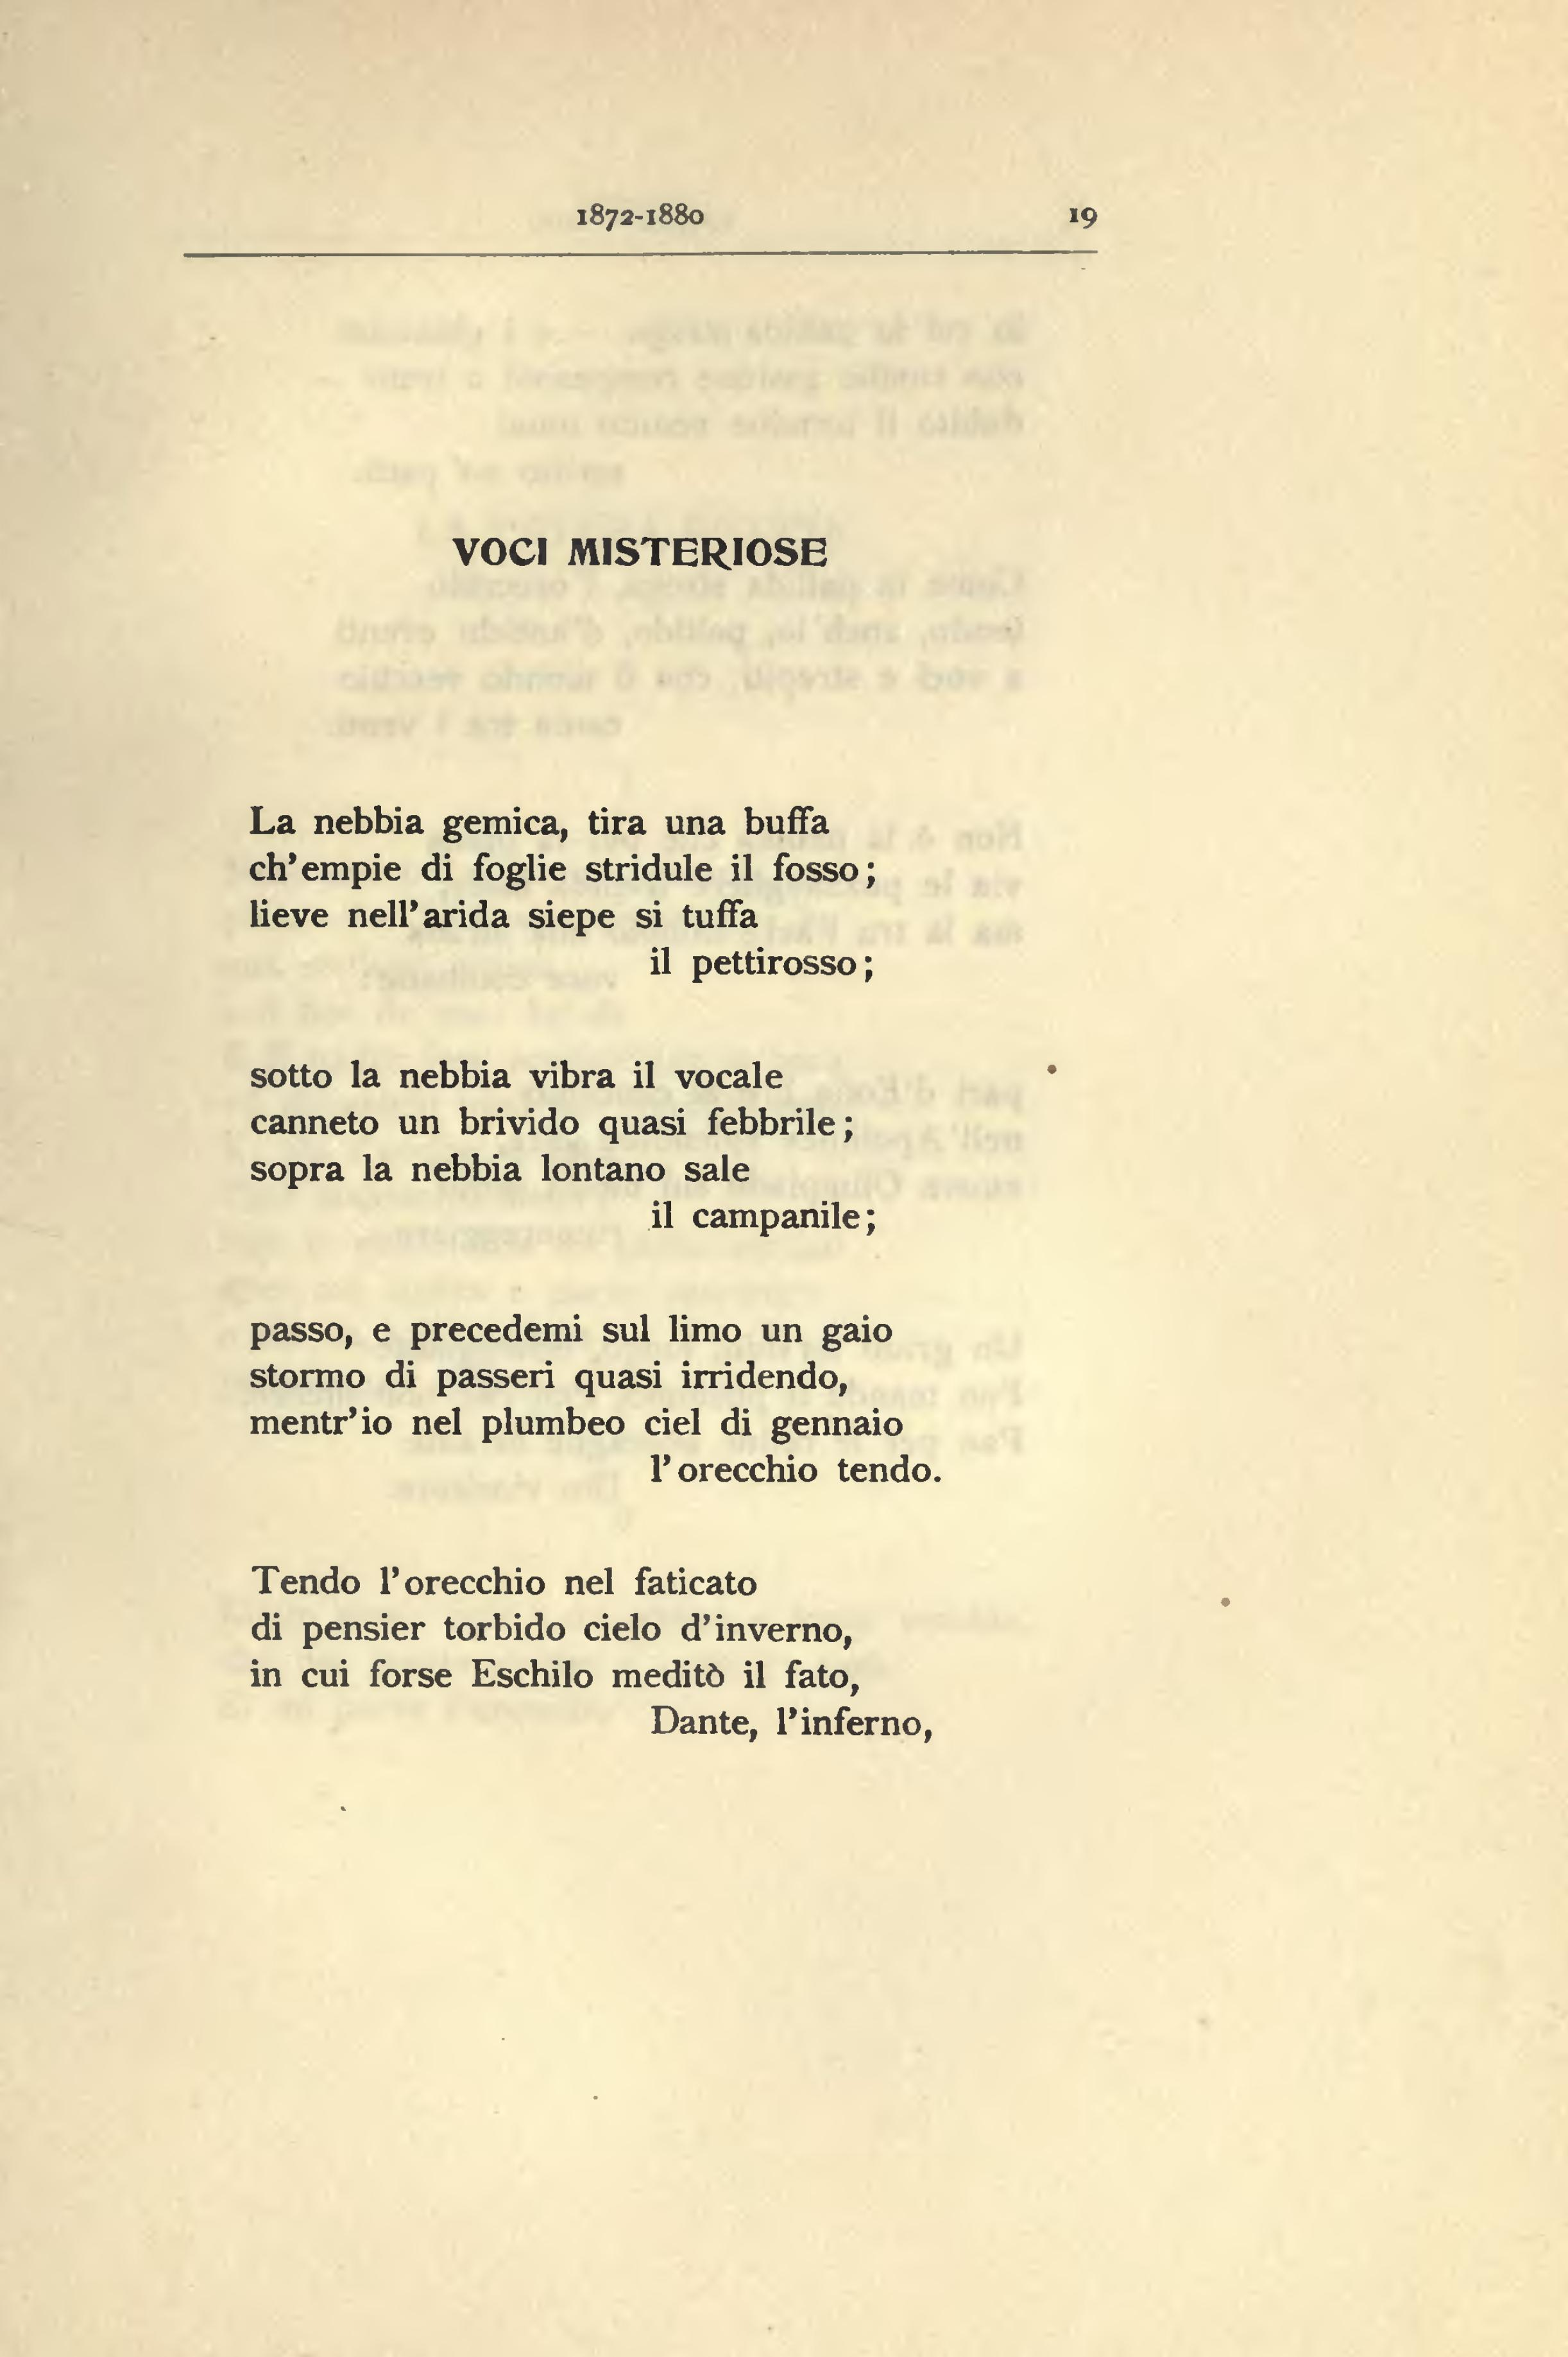 Pagina Poesie Varie Pascoli Djvu 41 Wikisource